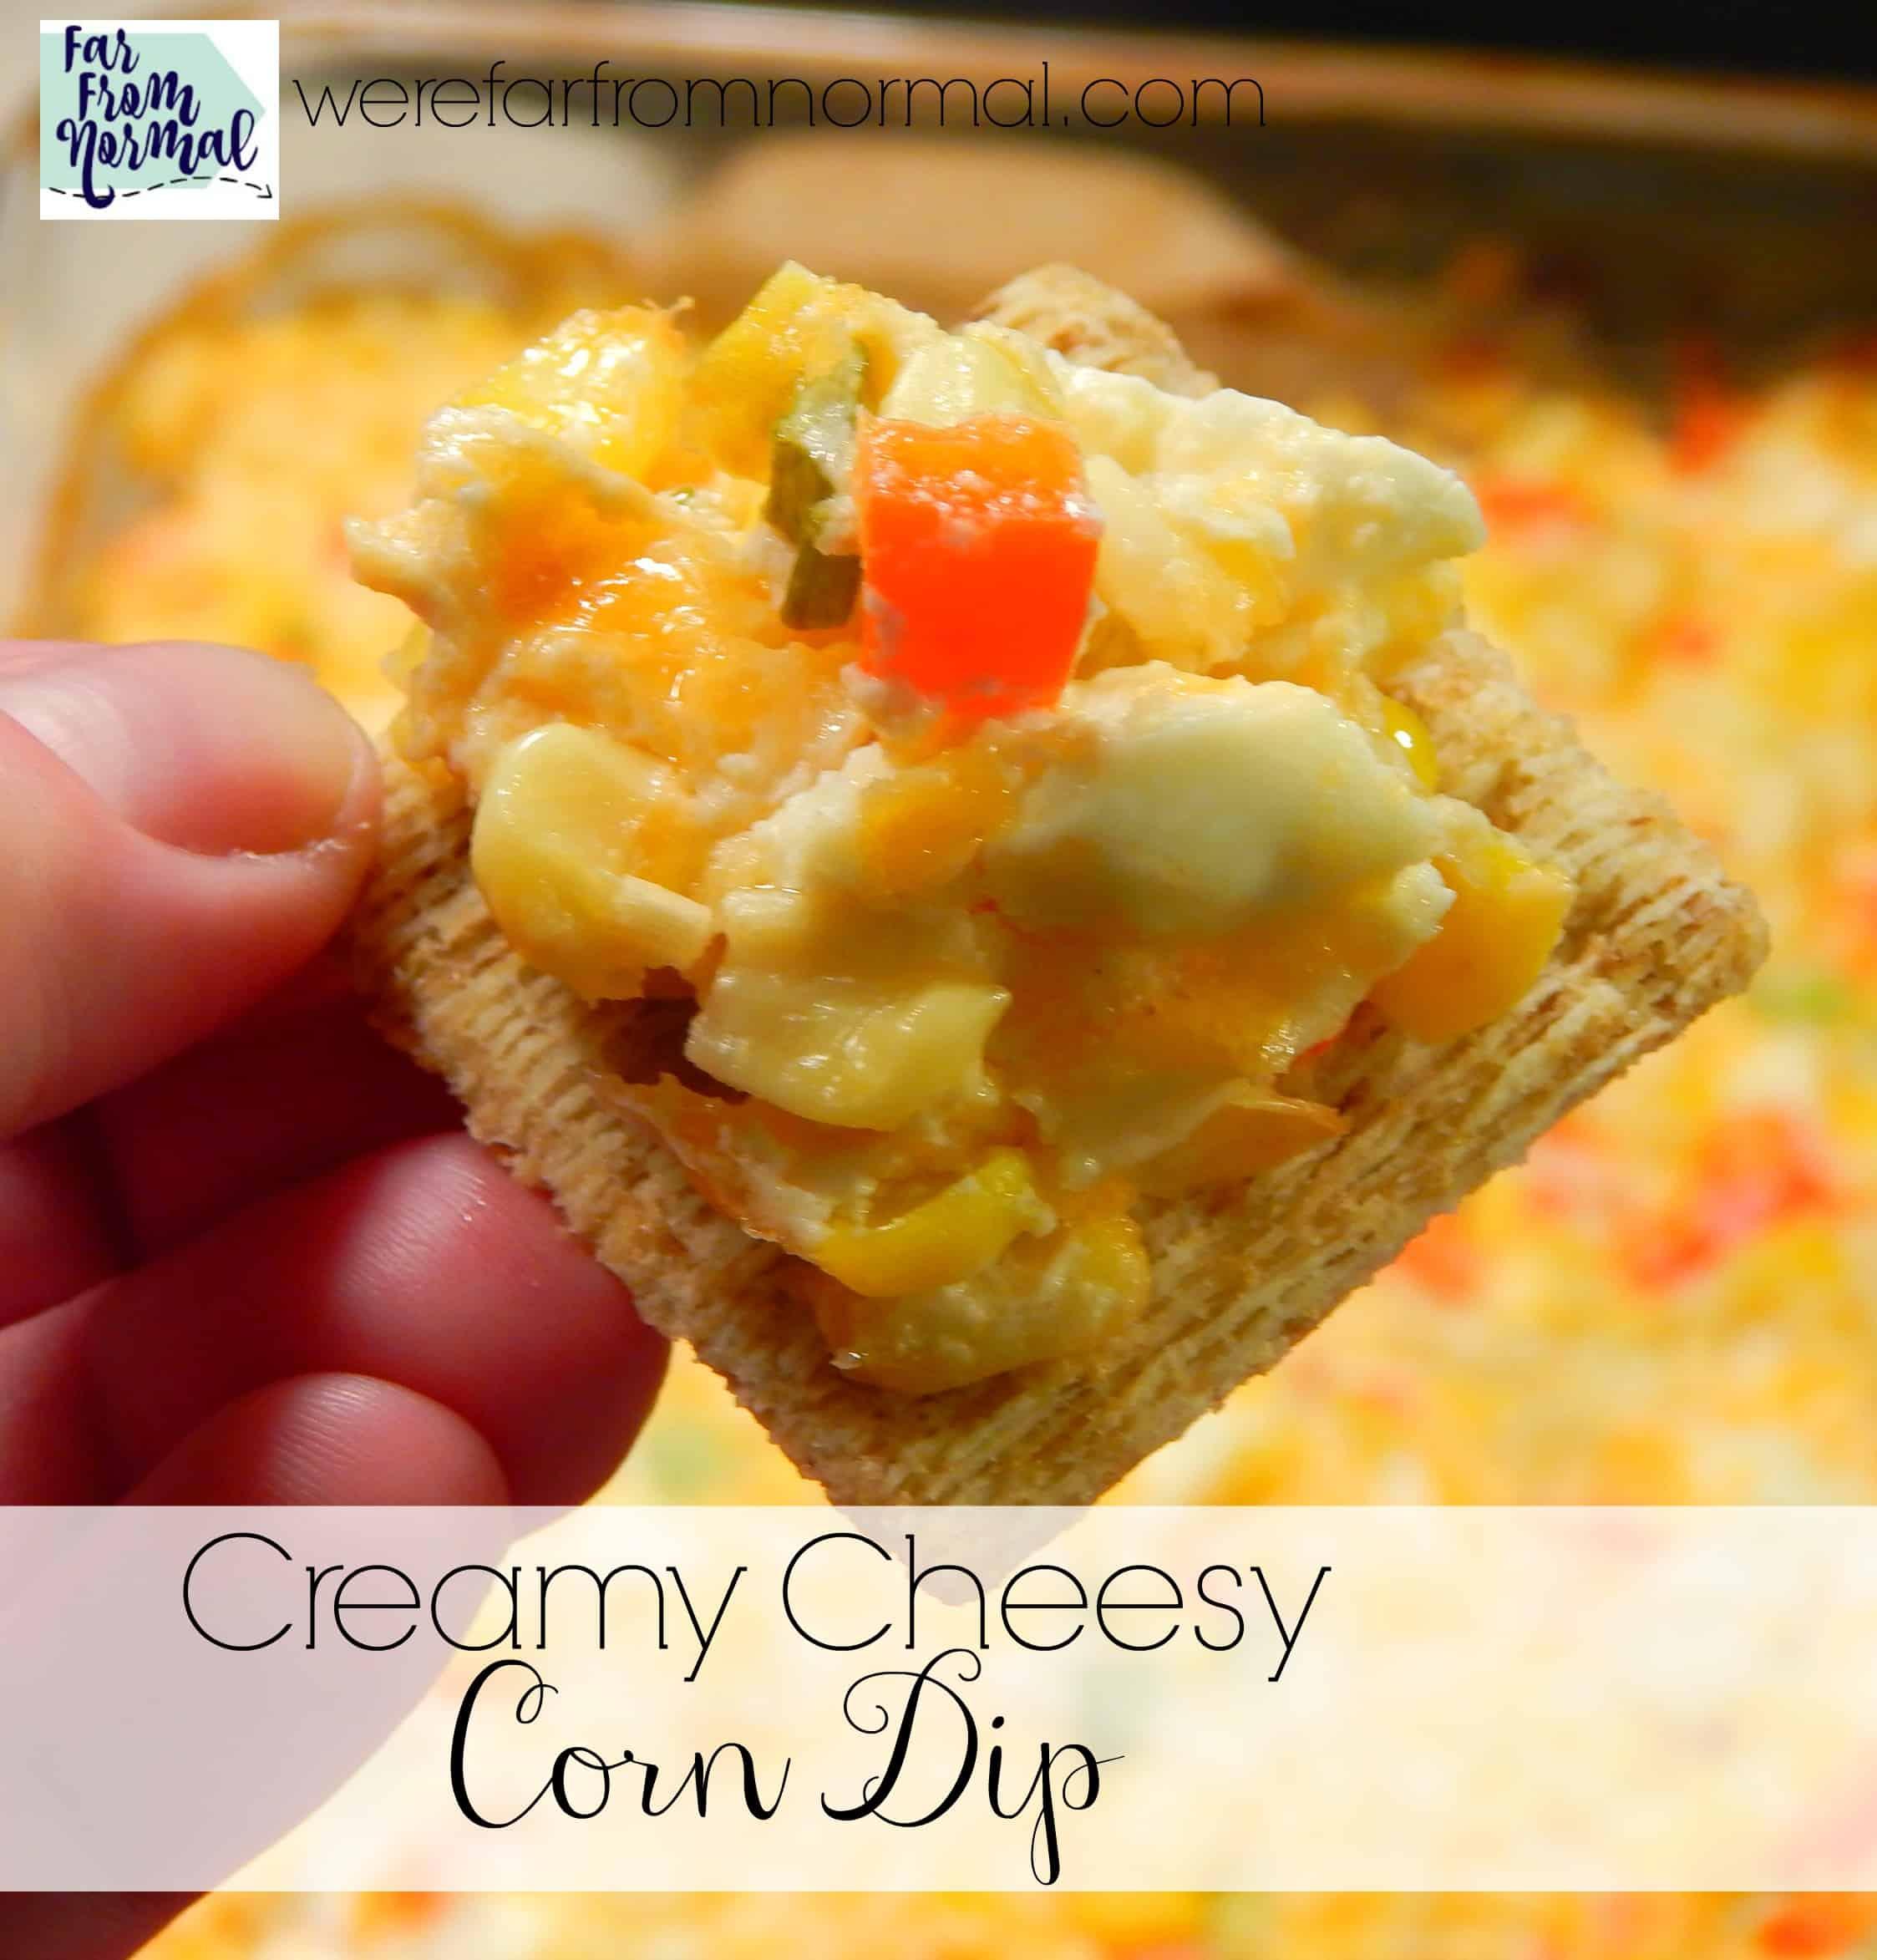 Delicious Creamy Cheesy Corn Dip